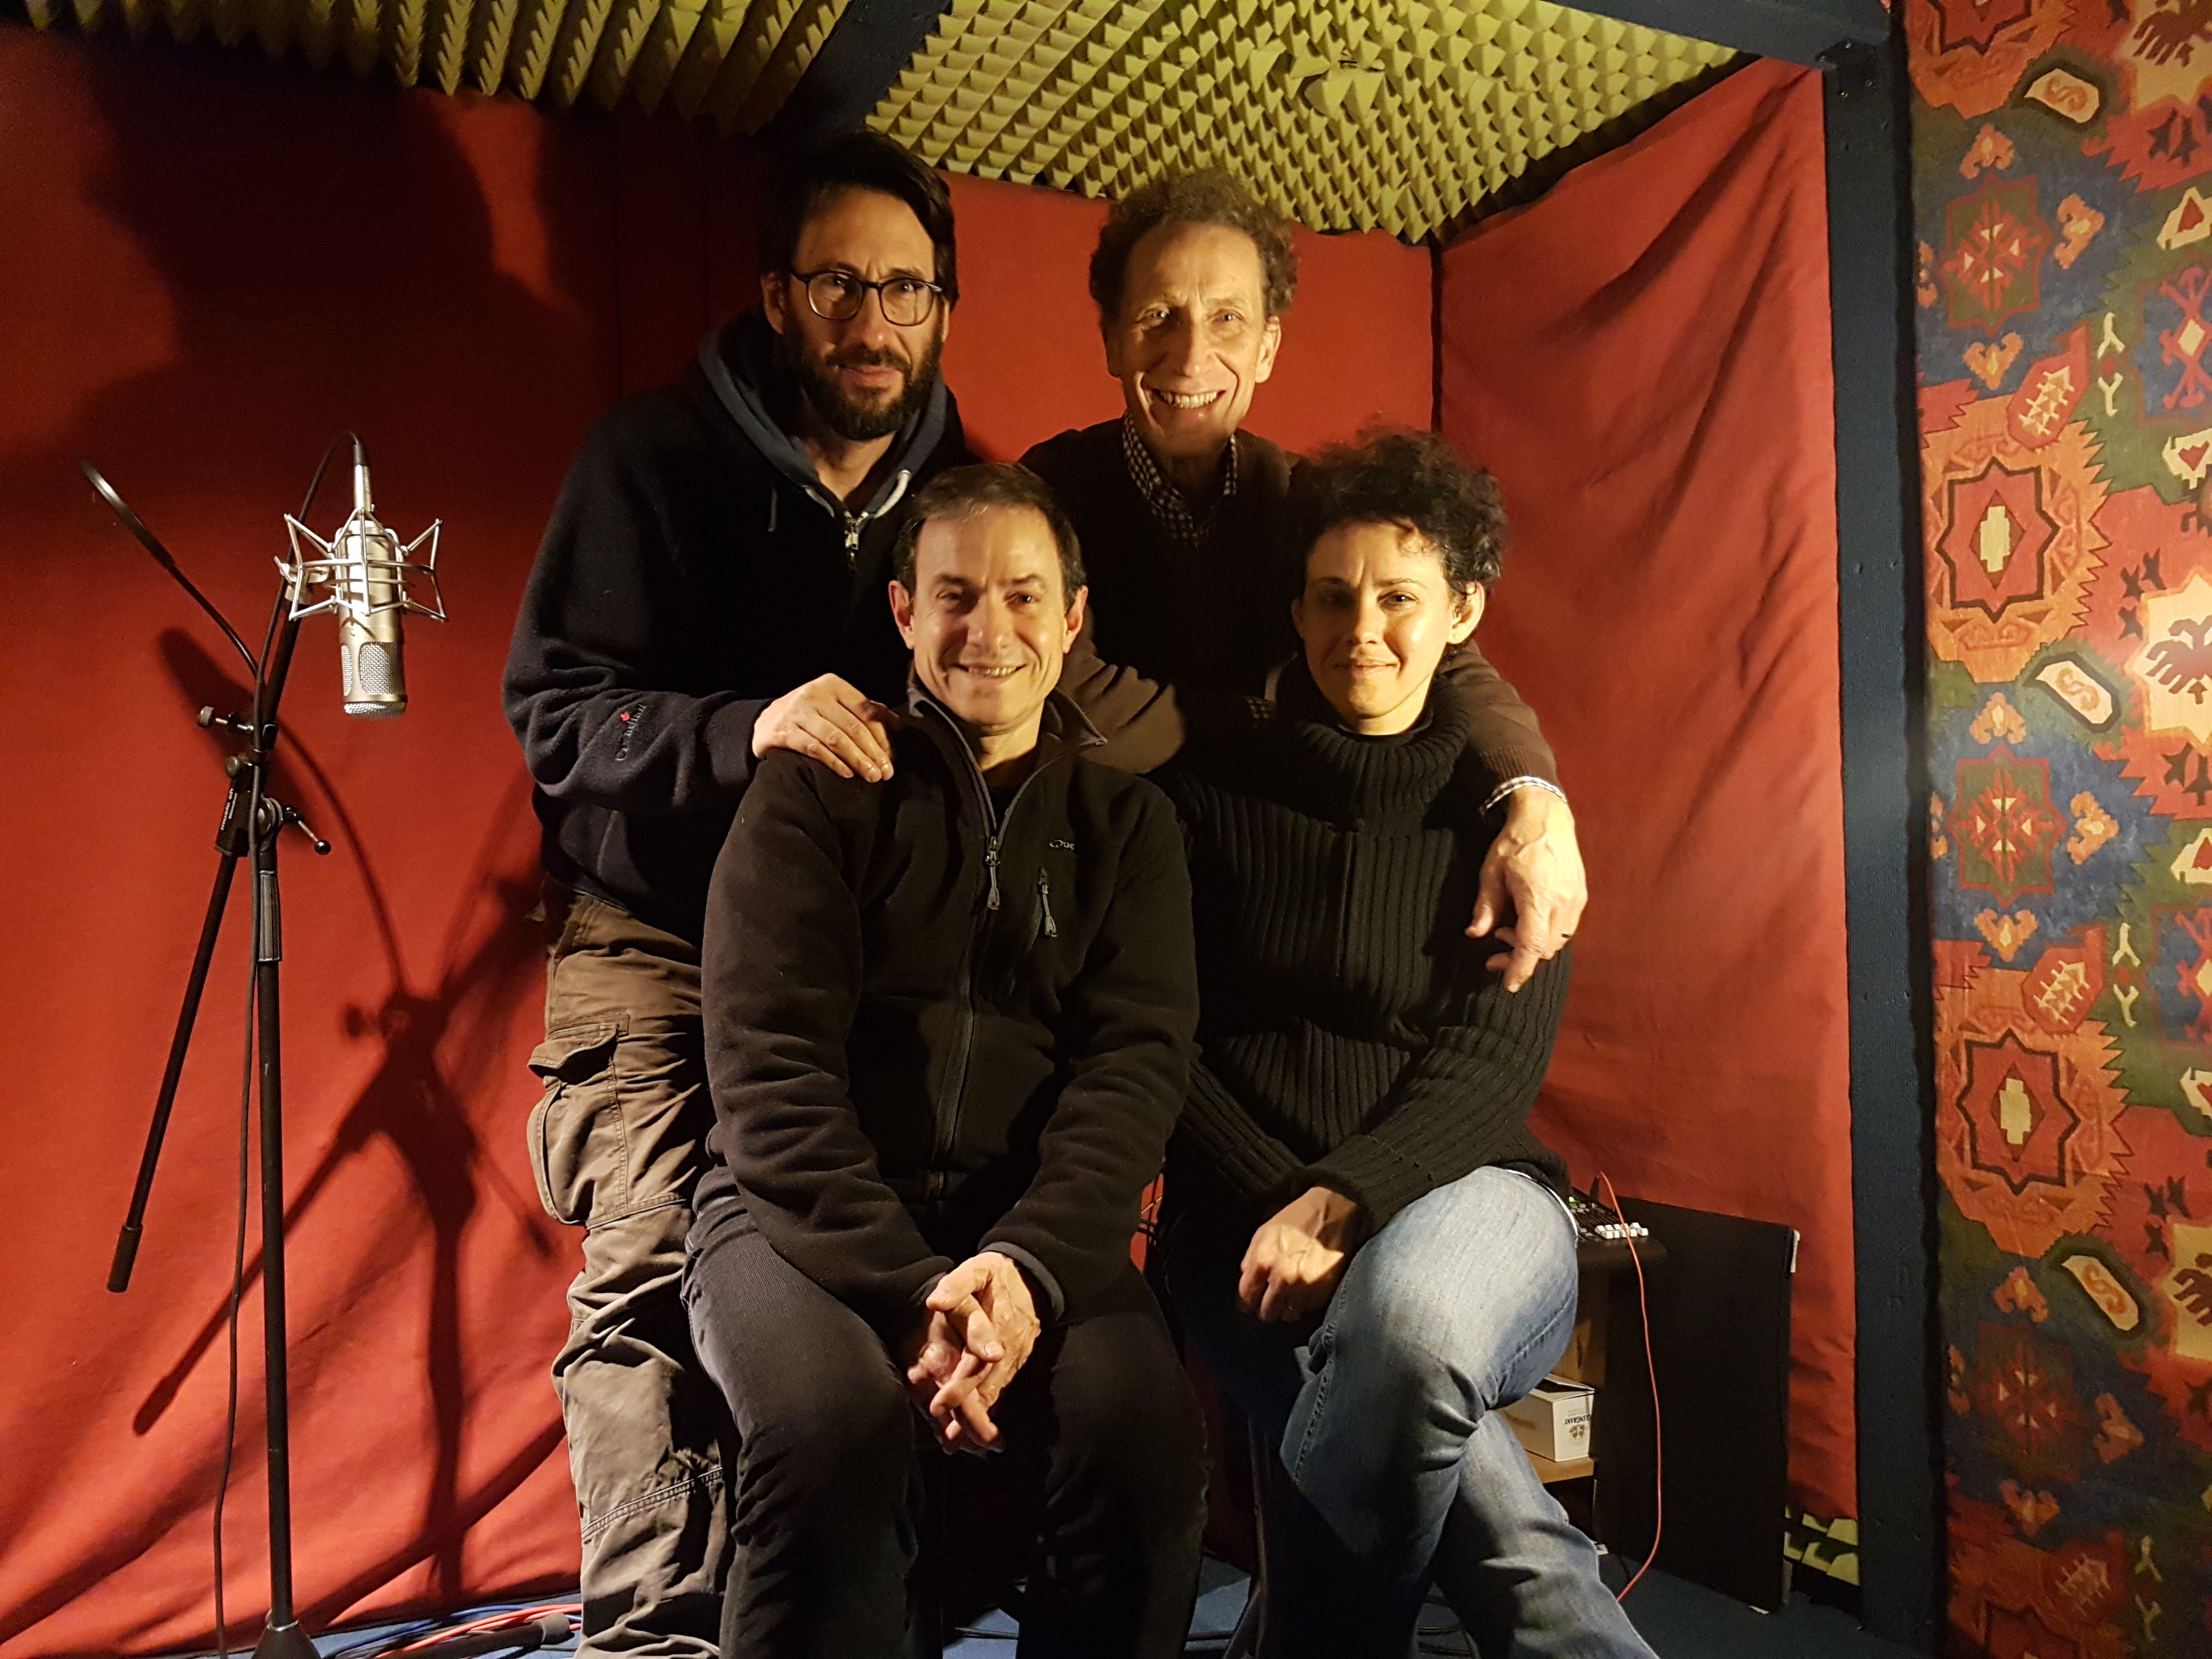 Jobi+S.Onofri+F.Sciacca+Annamaria